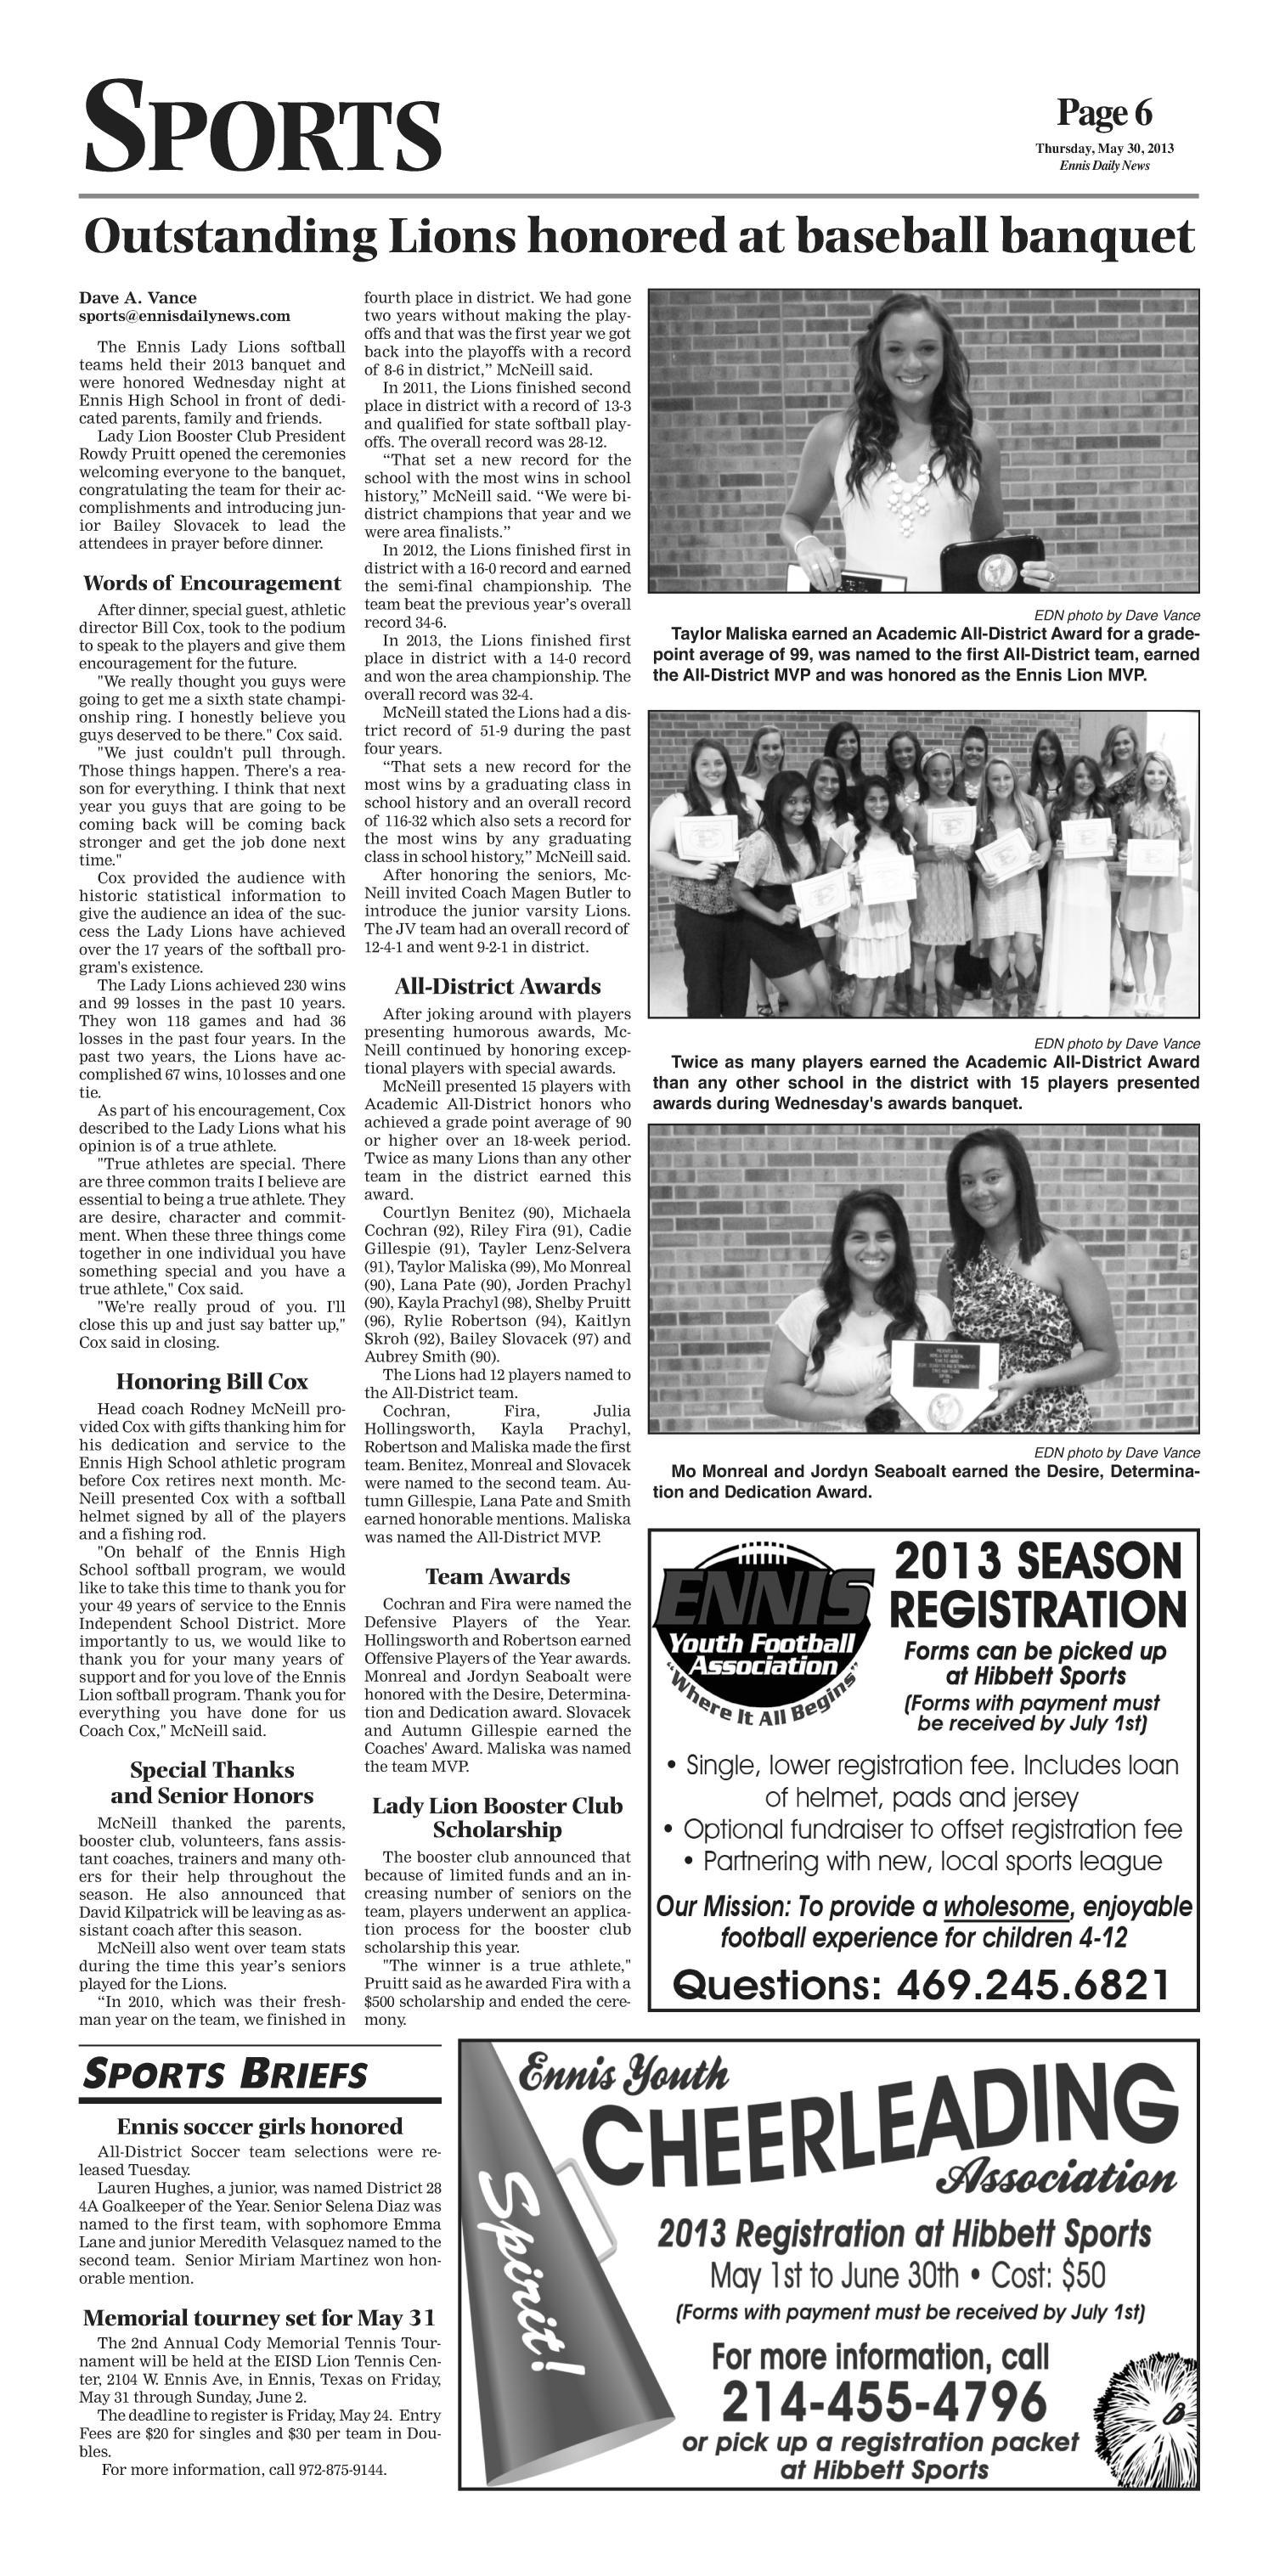 The Ennis Daily News (Ennis, Tex.), Ed. 1 Thursday, May 30, 2013 ...